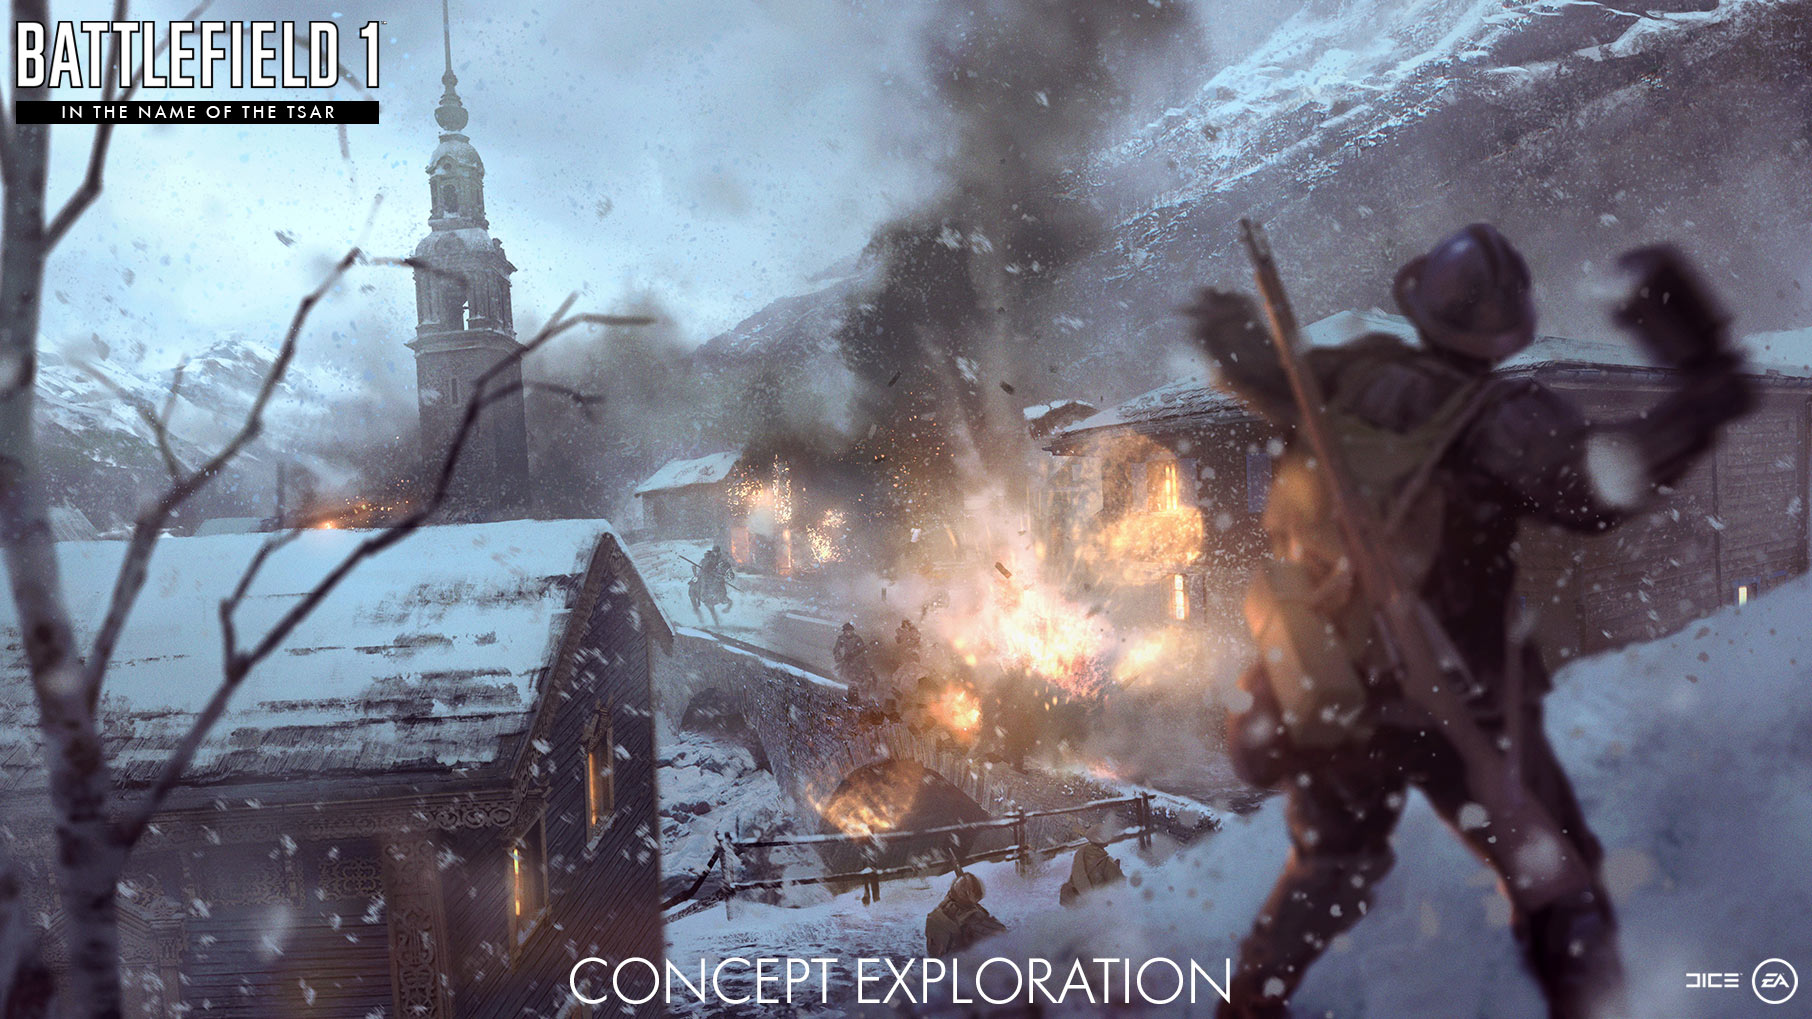 https://media-www-battlefieldwebcore.spark.ea.com/content/battlefield-portal/fr_FR/games/battlefield-1/in-the-name-of-the-tsar/_jcr_content/par/section_0/columns/column/content/editorial_2/image/large.img.jpg